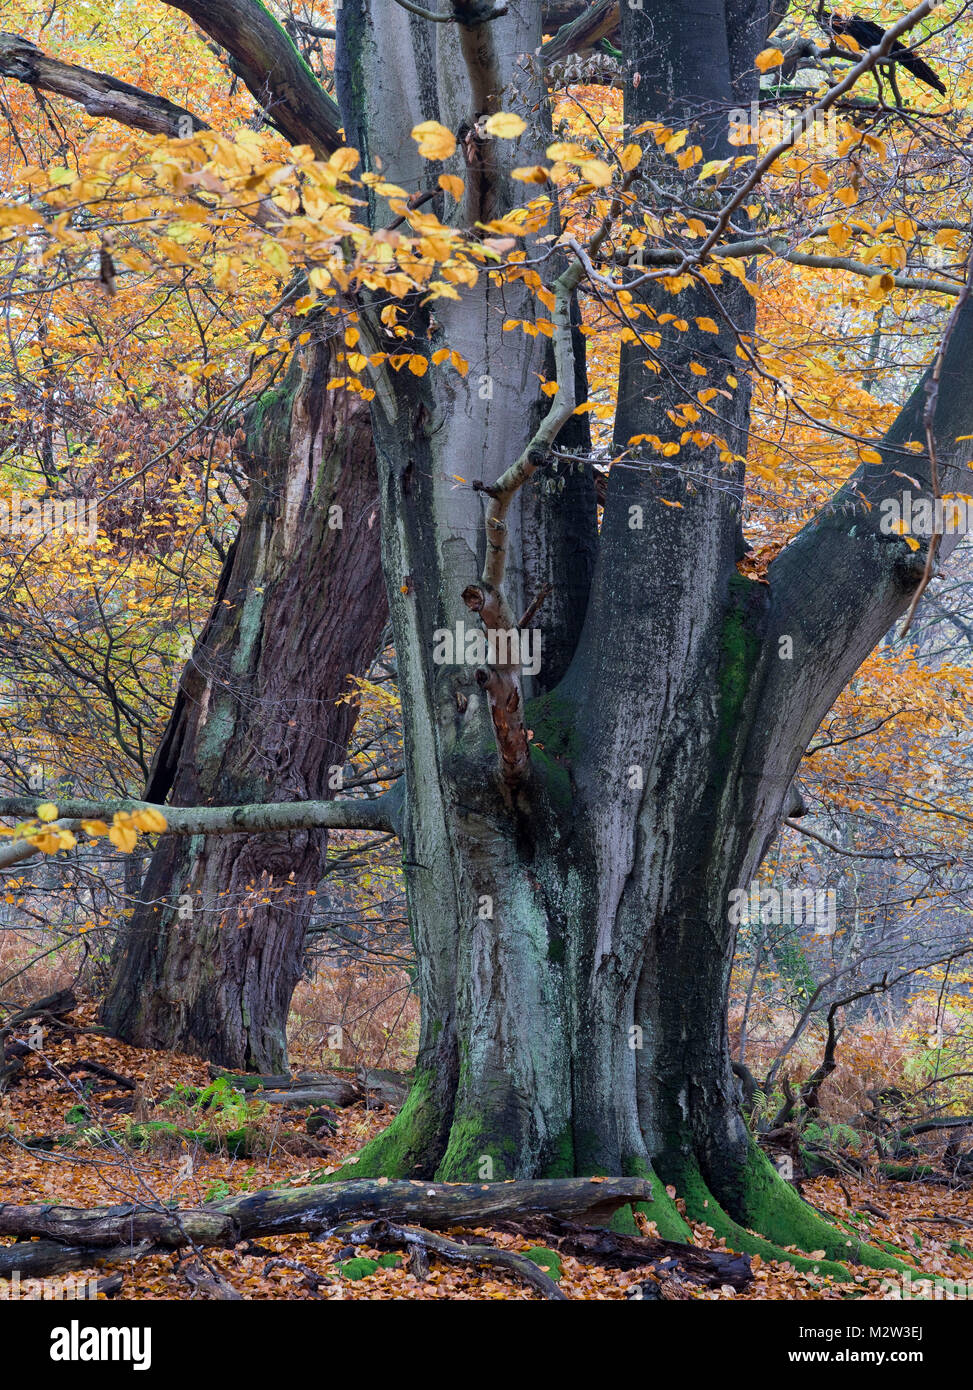 Old beeches in the Urwald Sababurg, Reinhardswald, Hessia, Germany - Stock Image